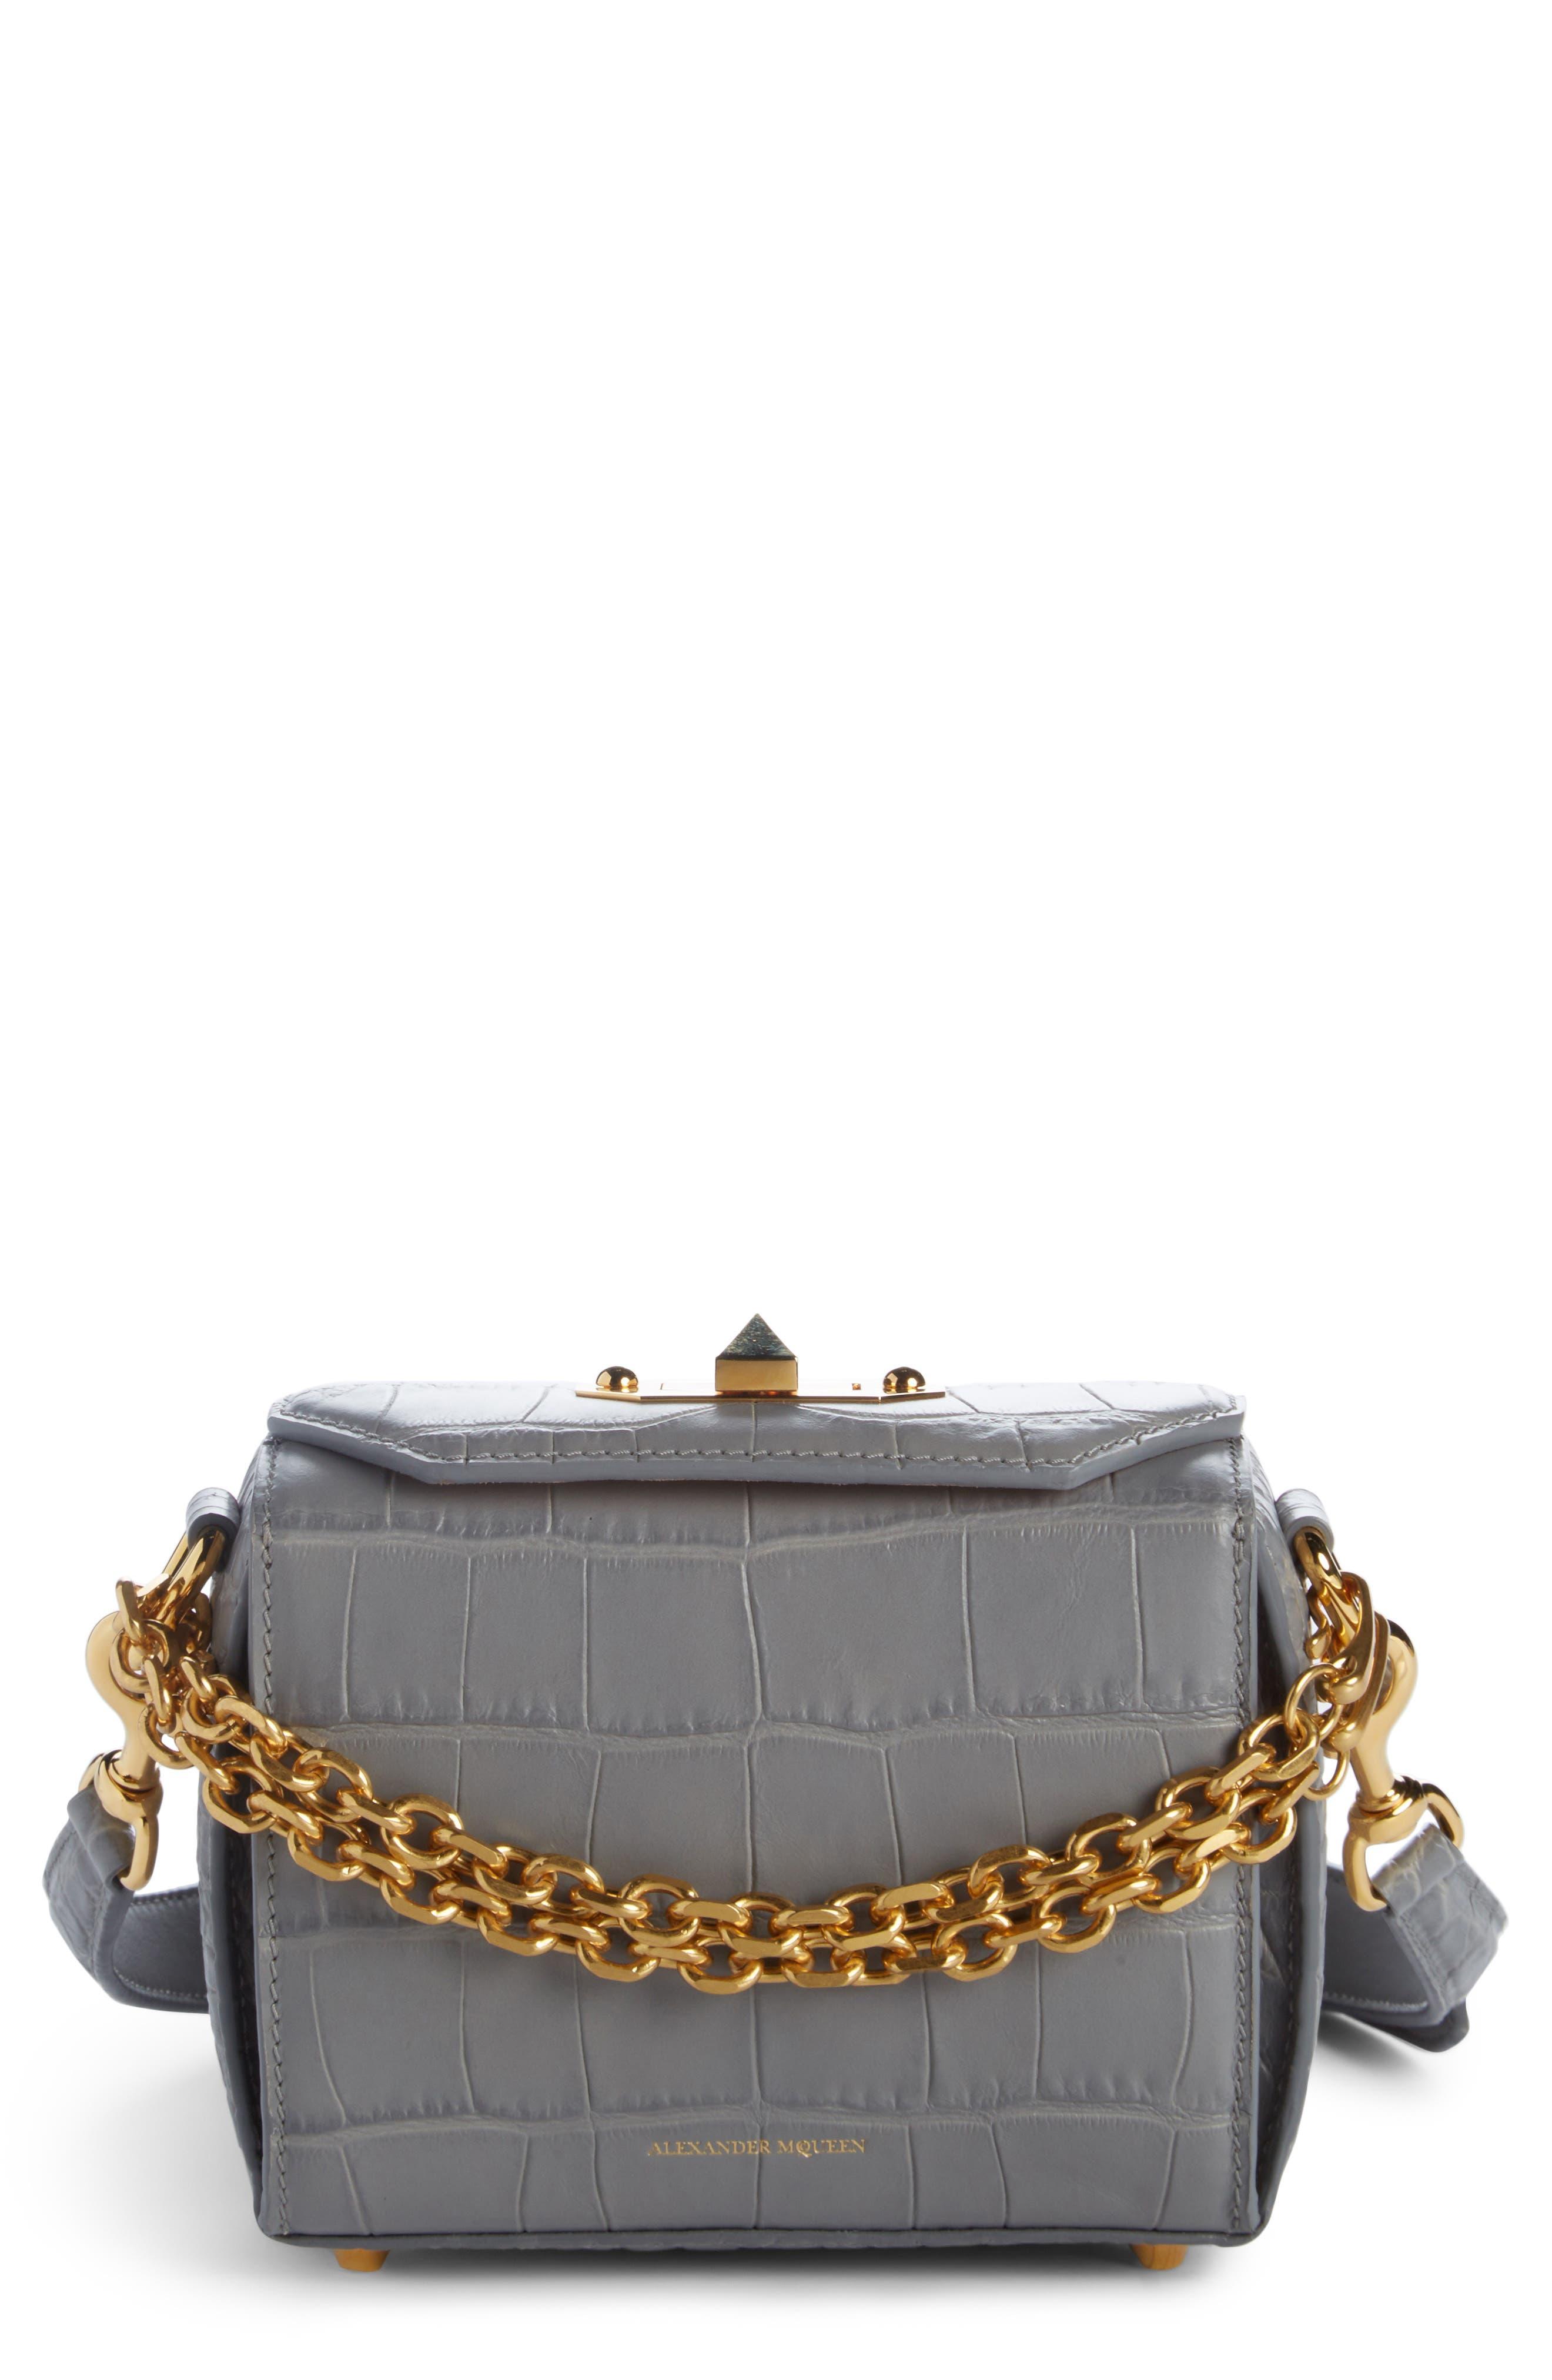 Alternate Image 1 Selected - Alexander McQueen Mini Box Croc-Embossed Leather Bag